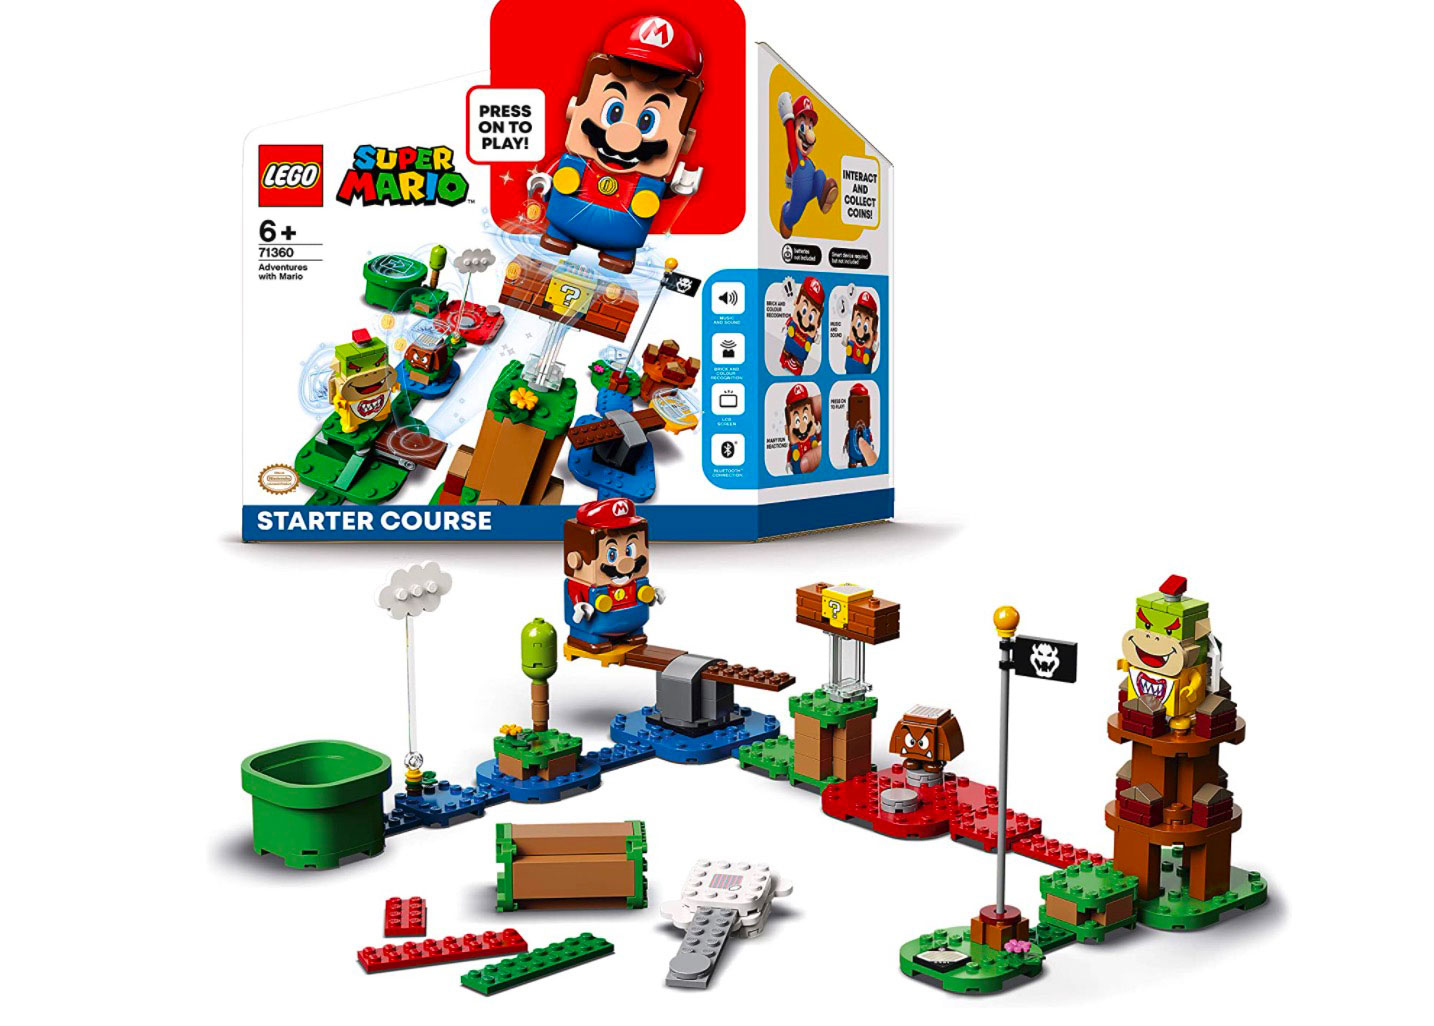 Le pack LEGO Mario est en promo